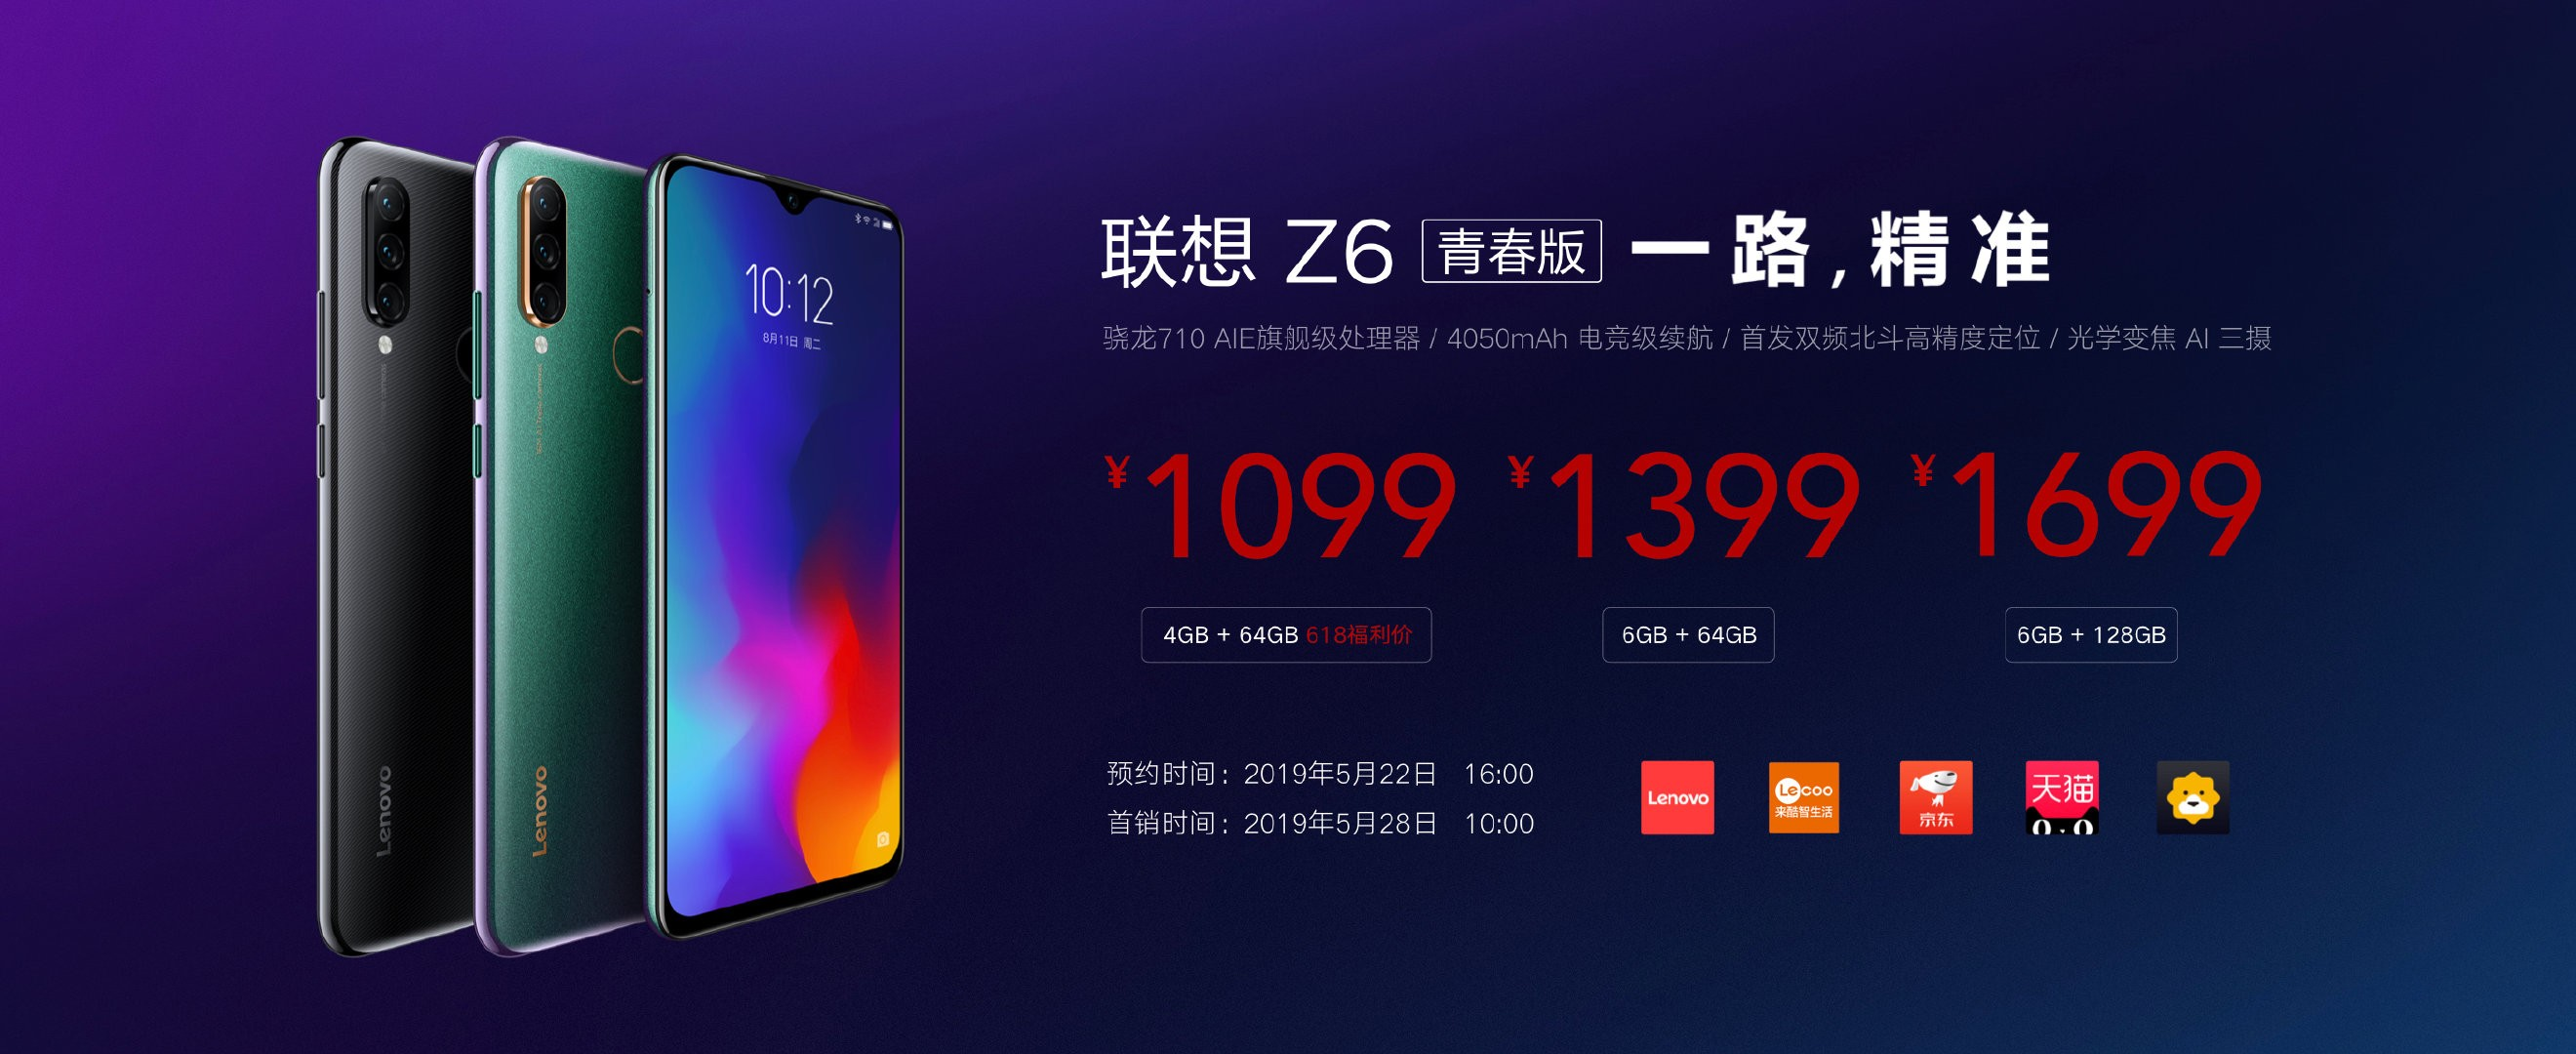 Lenovo Z6 Youth Edition Price